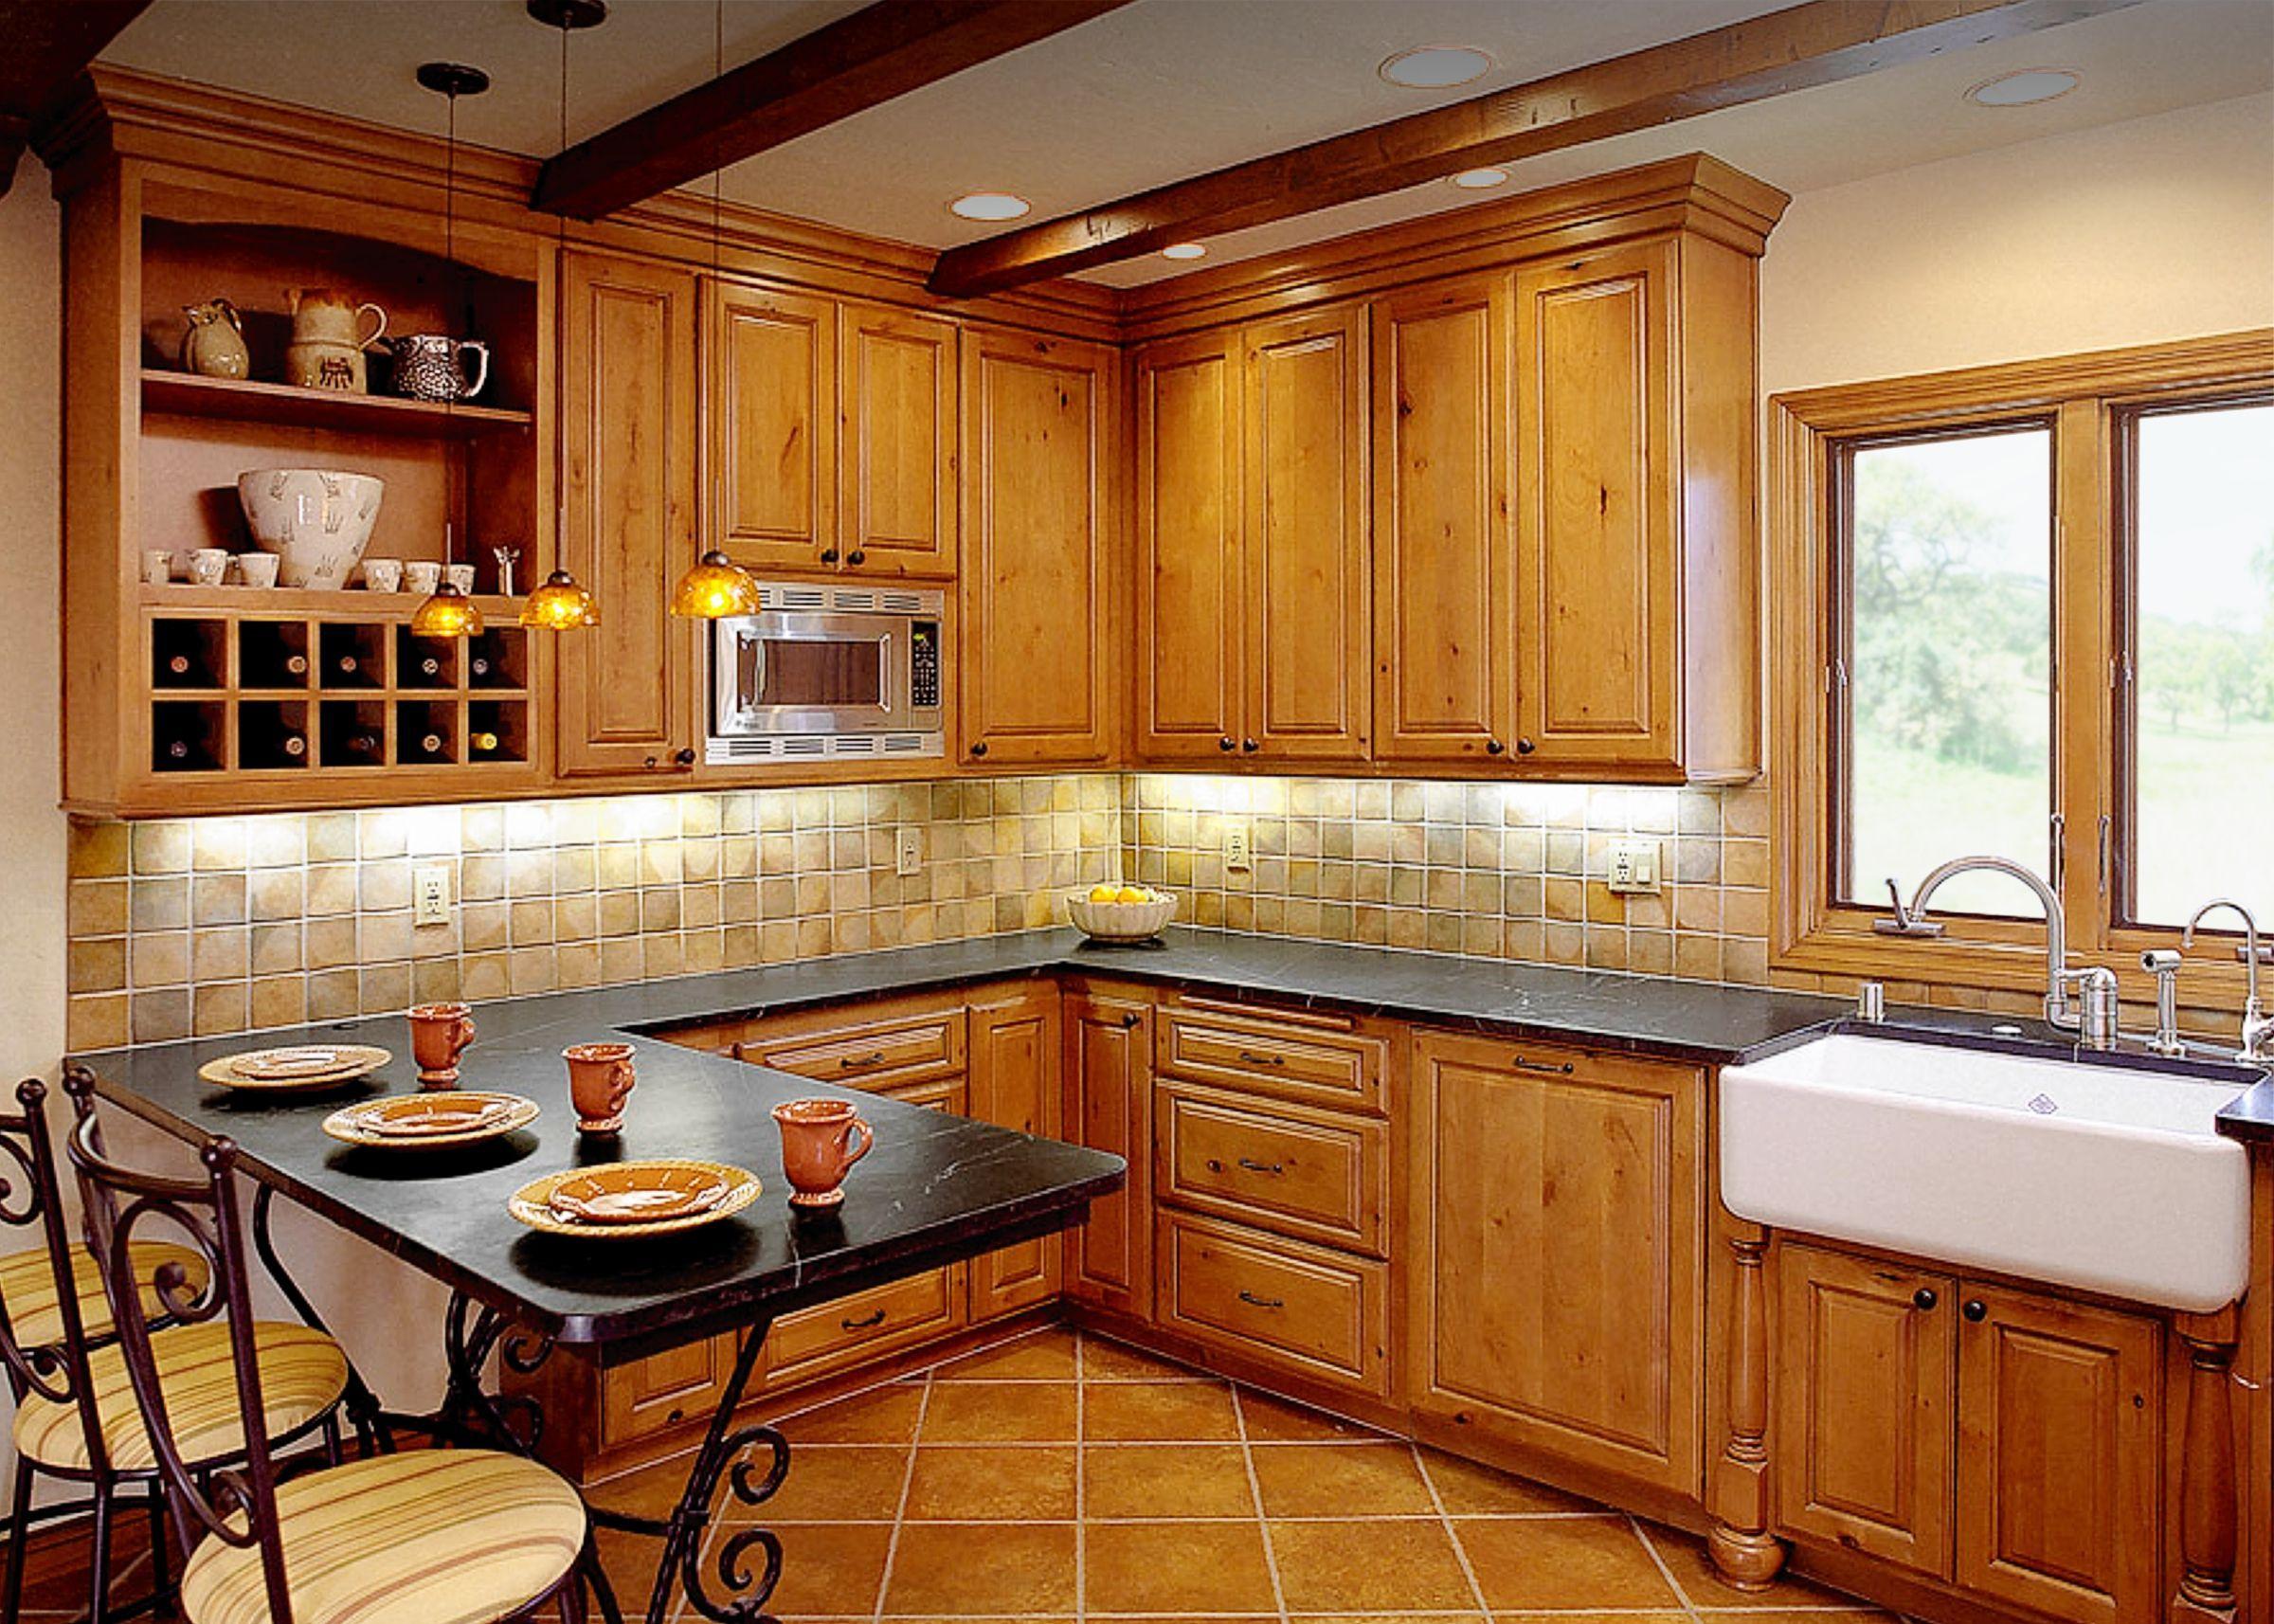 Rustic Remix Kitchen Remodel Long Beach Ca An Open Shelf Cabinet With Cubby Diy Dekoration Hochzeit Dekoration Diy Dekoration